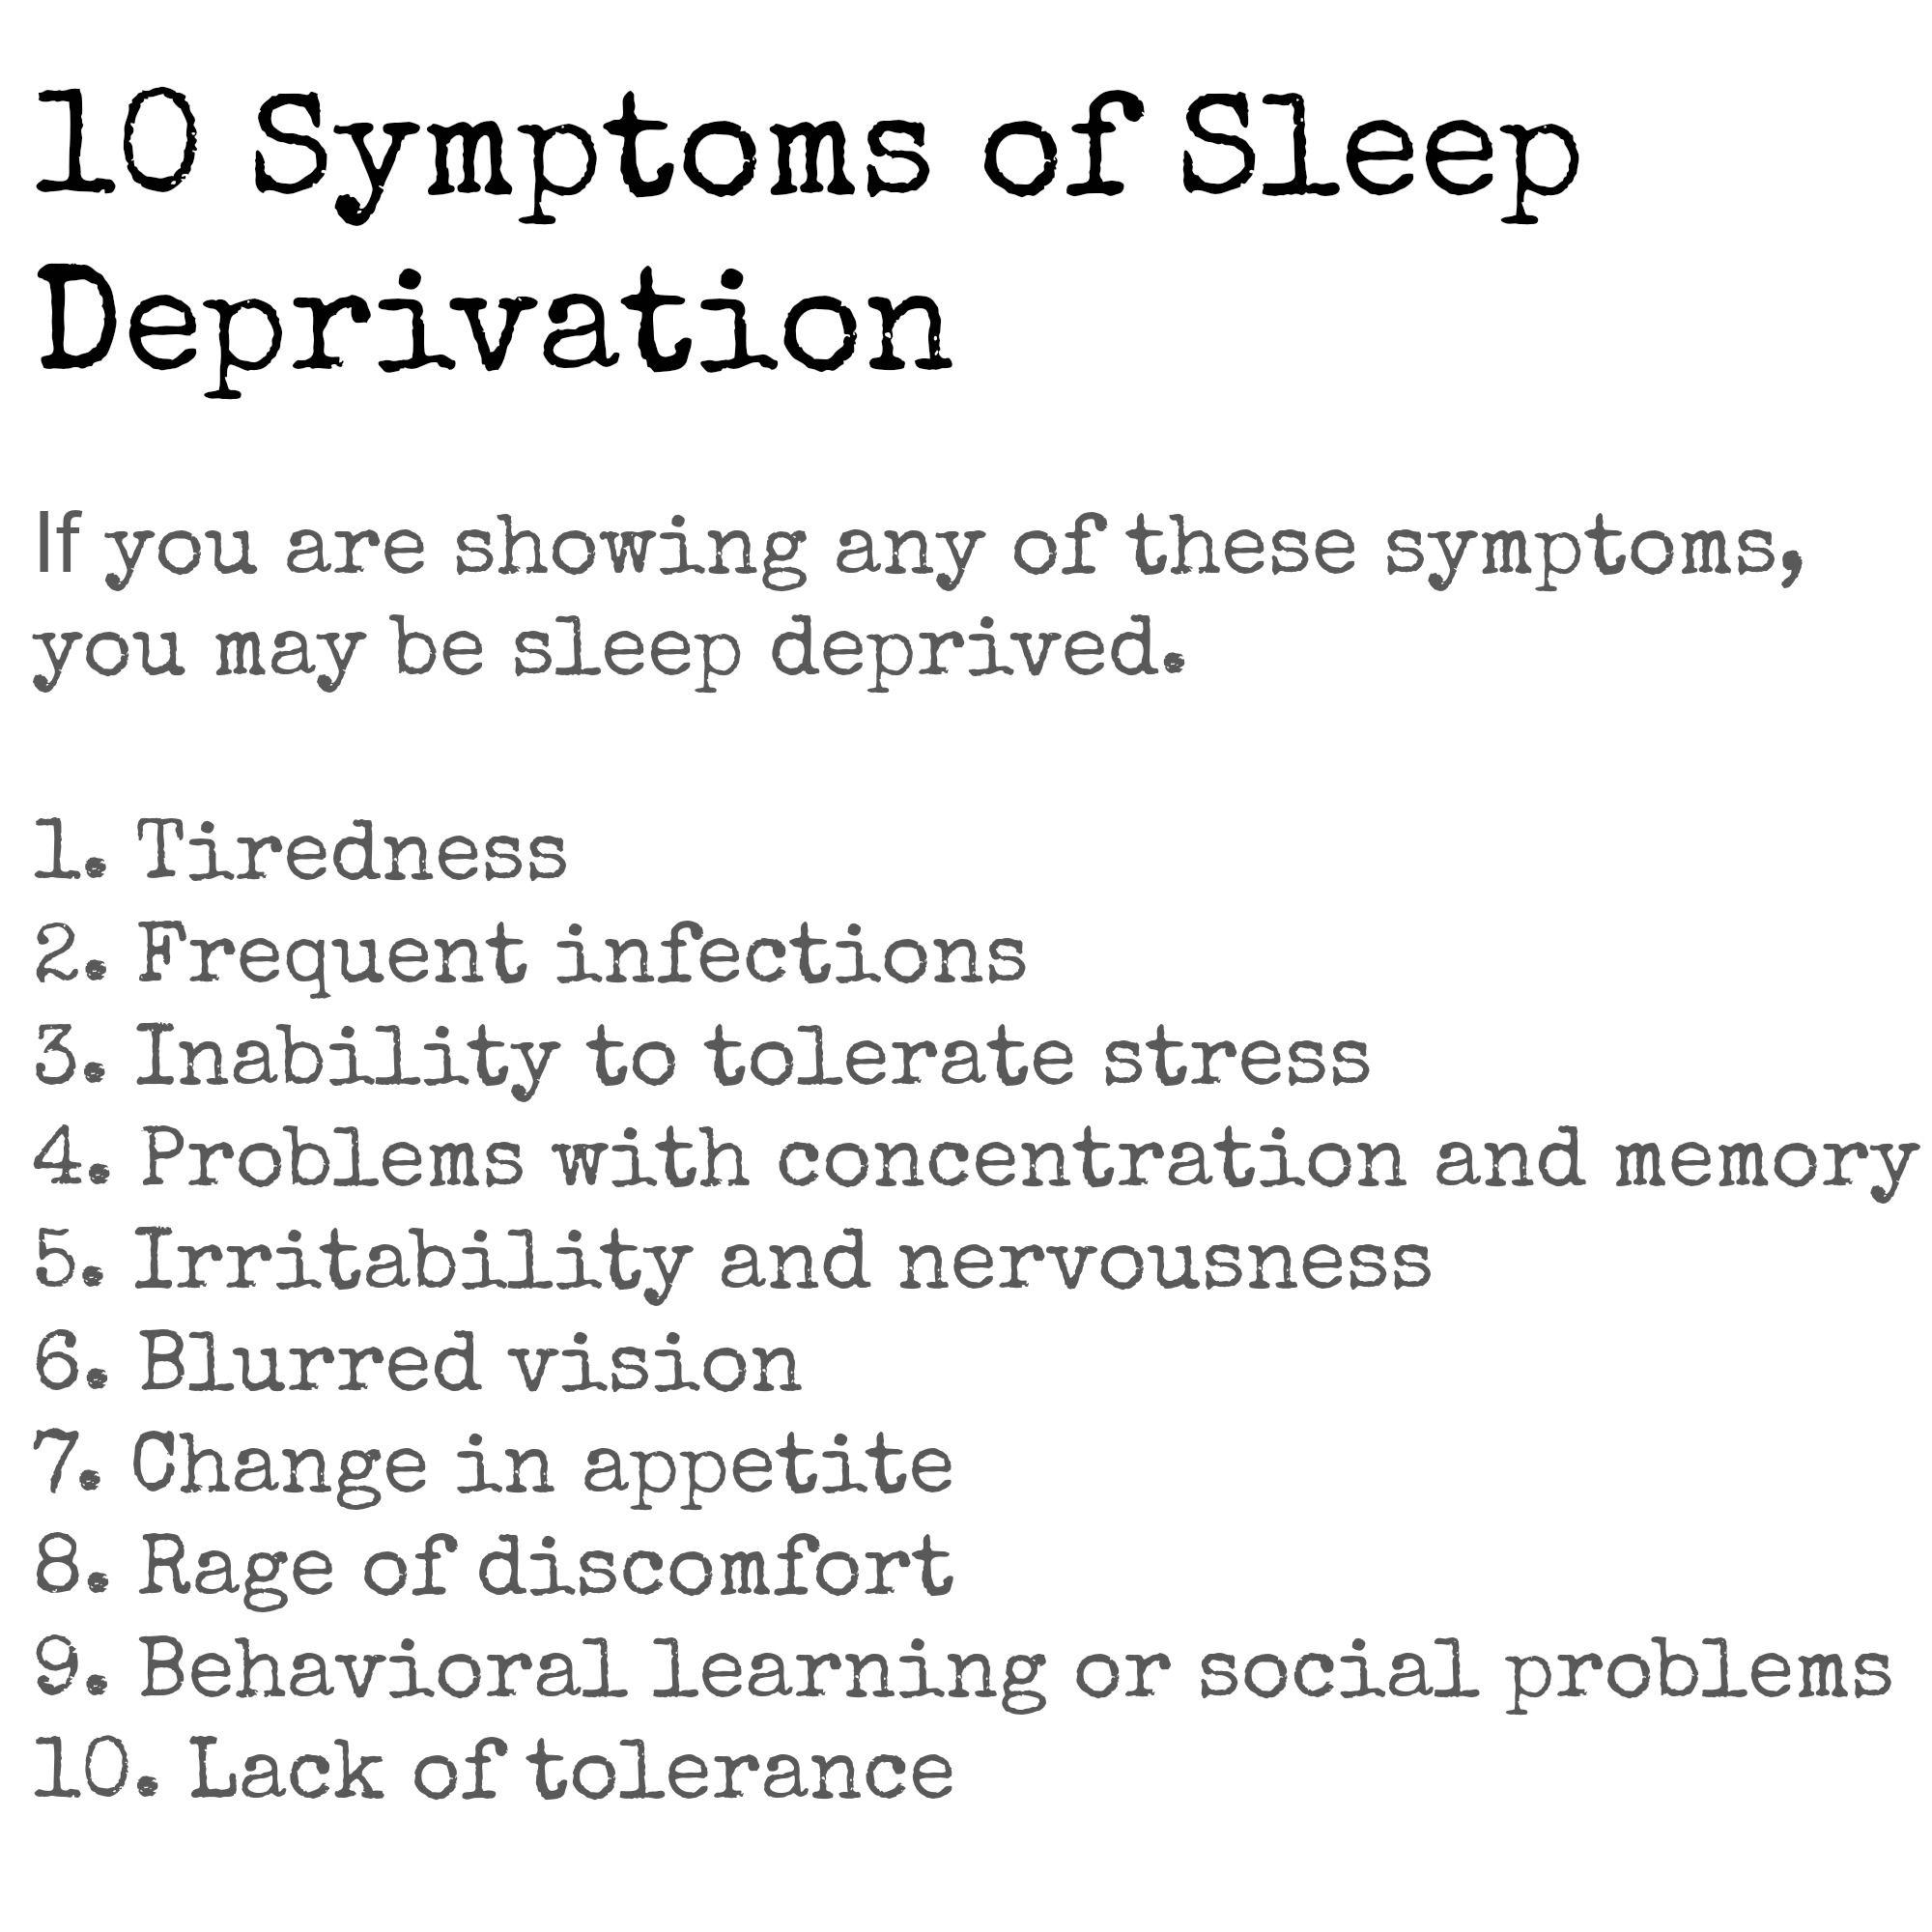 10 Symptoms Of Sleep Deprivation Www Wenatex Com Au Wenatex